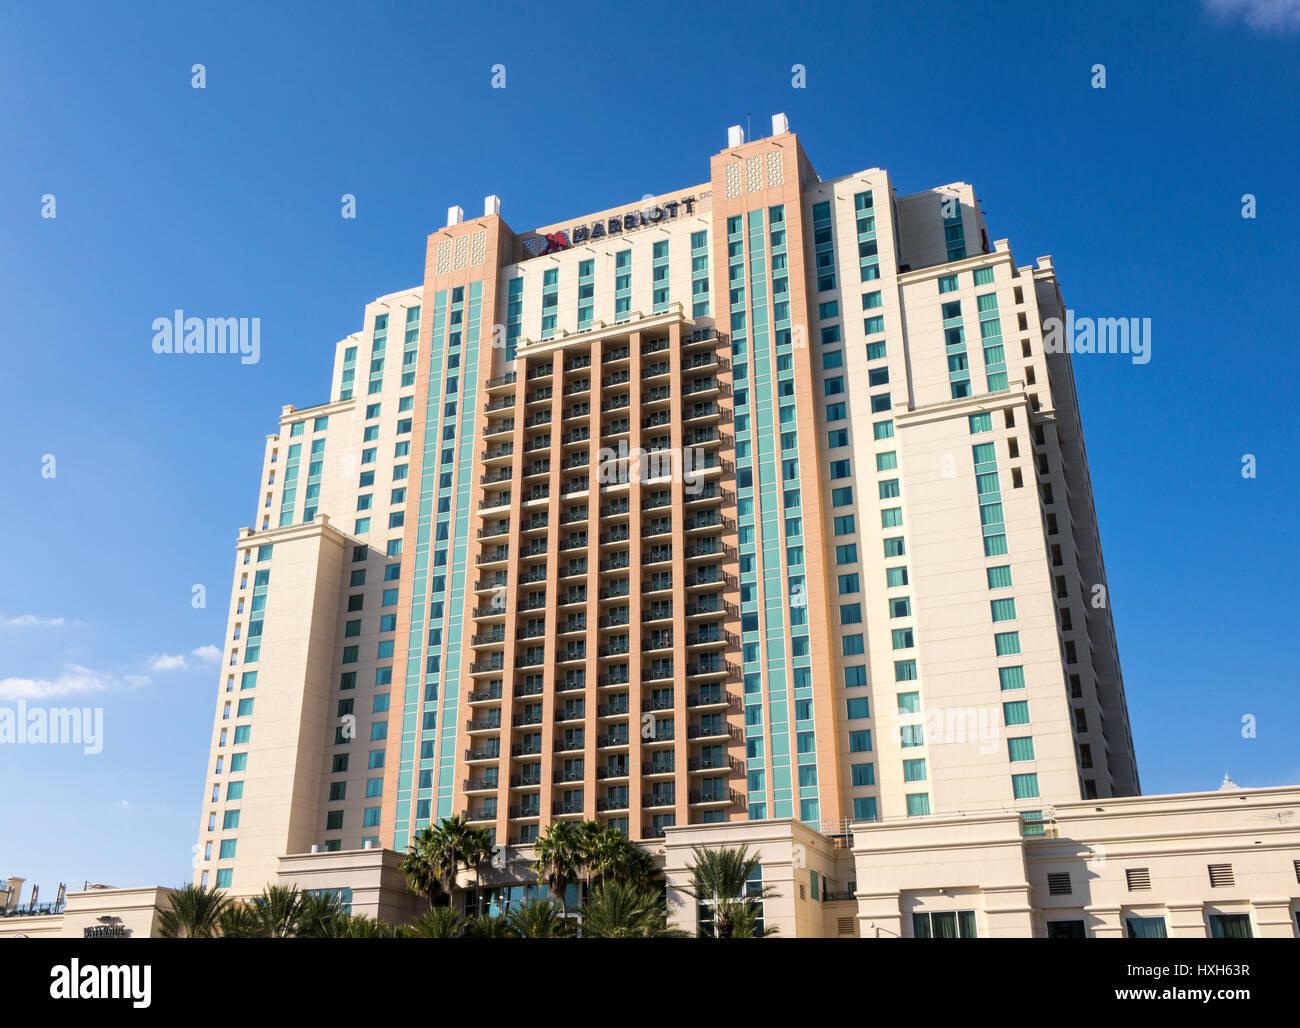 Marriott Hotel, Tampa, Florida, USA Stock Photo